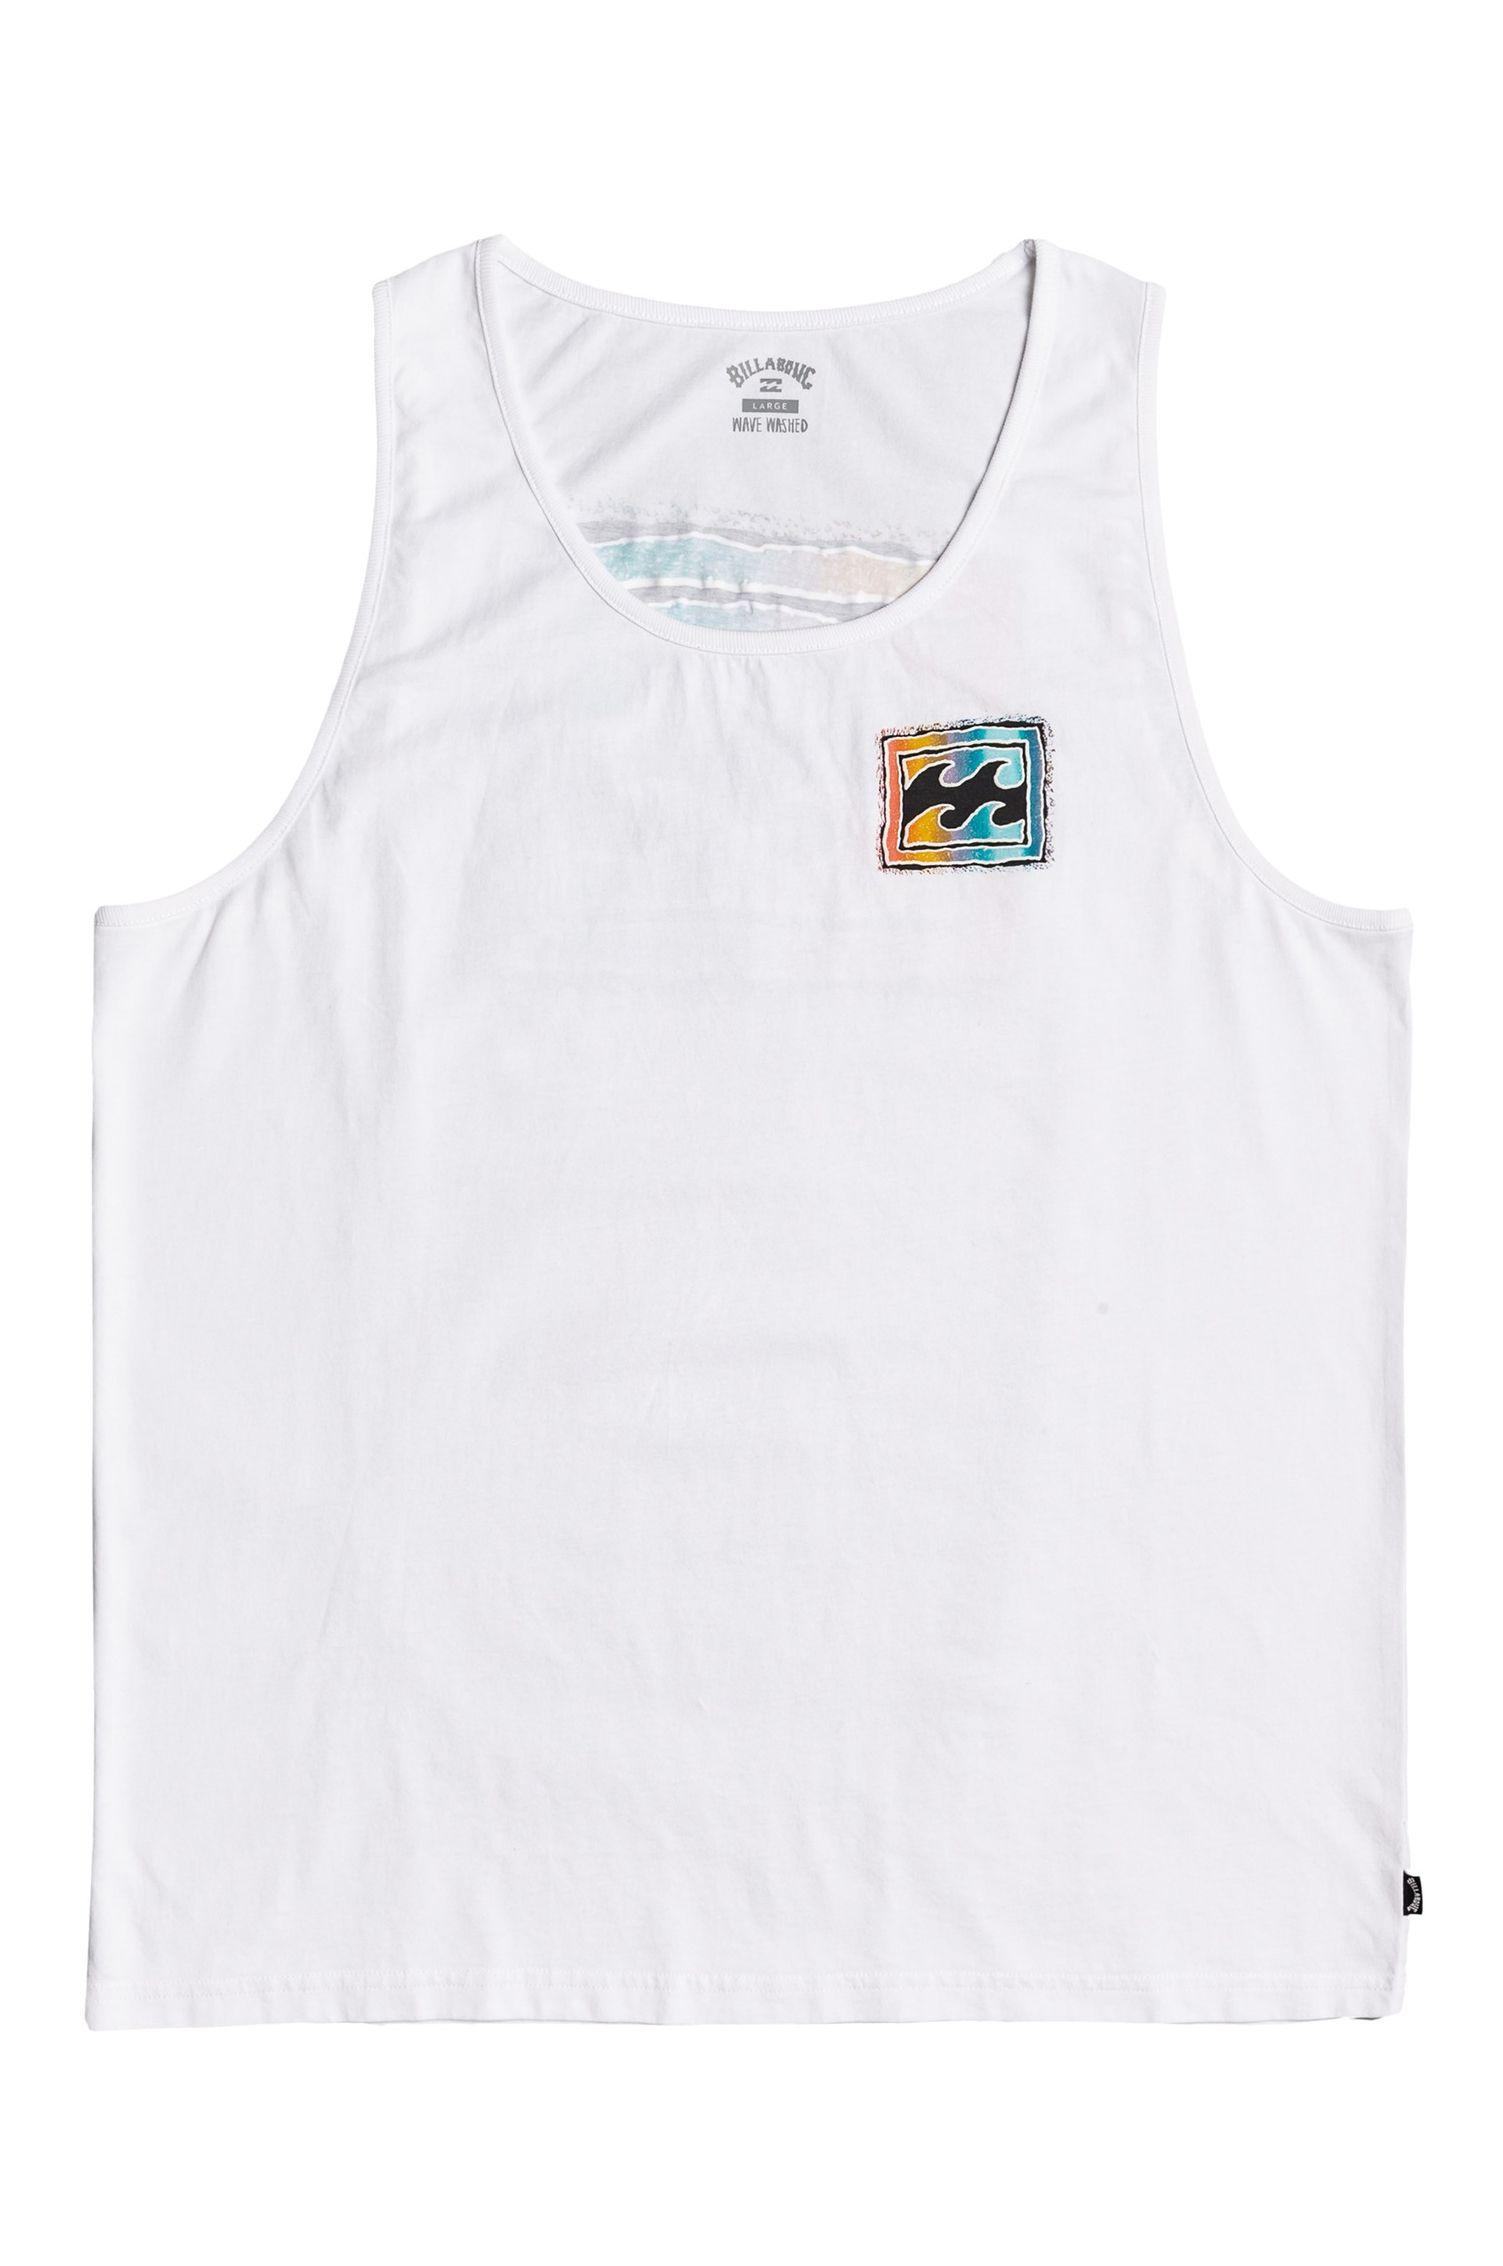 Billabong T-Shirt Tank Top HERITAGE TANK WAVE WASH White